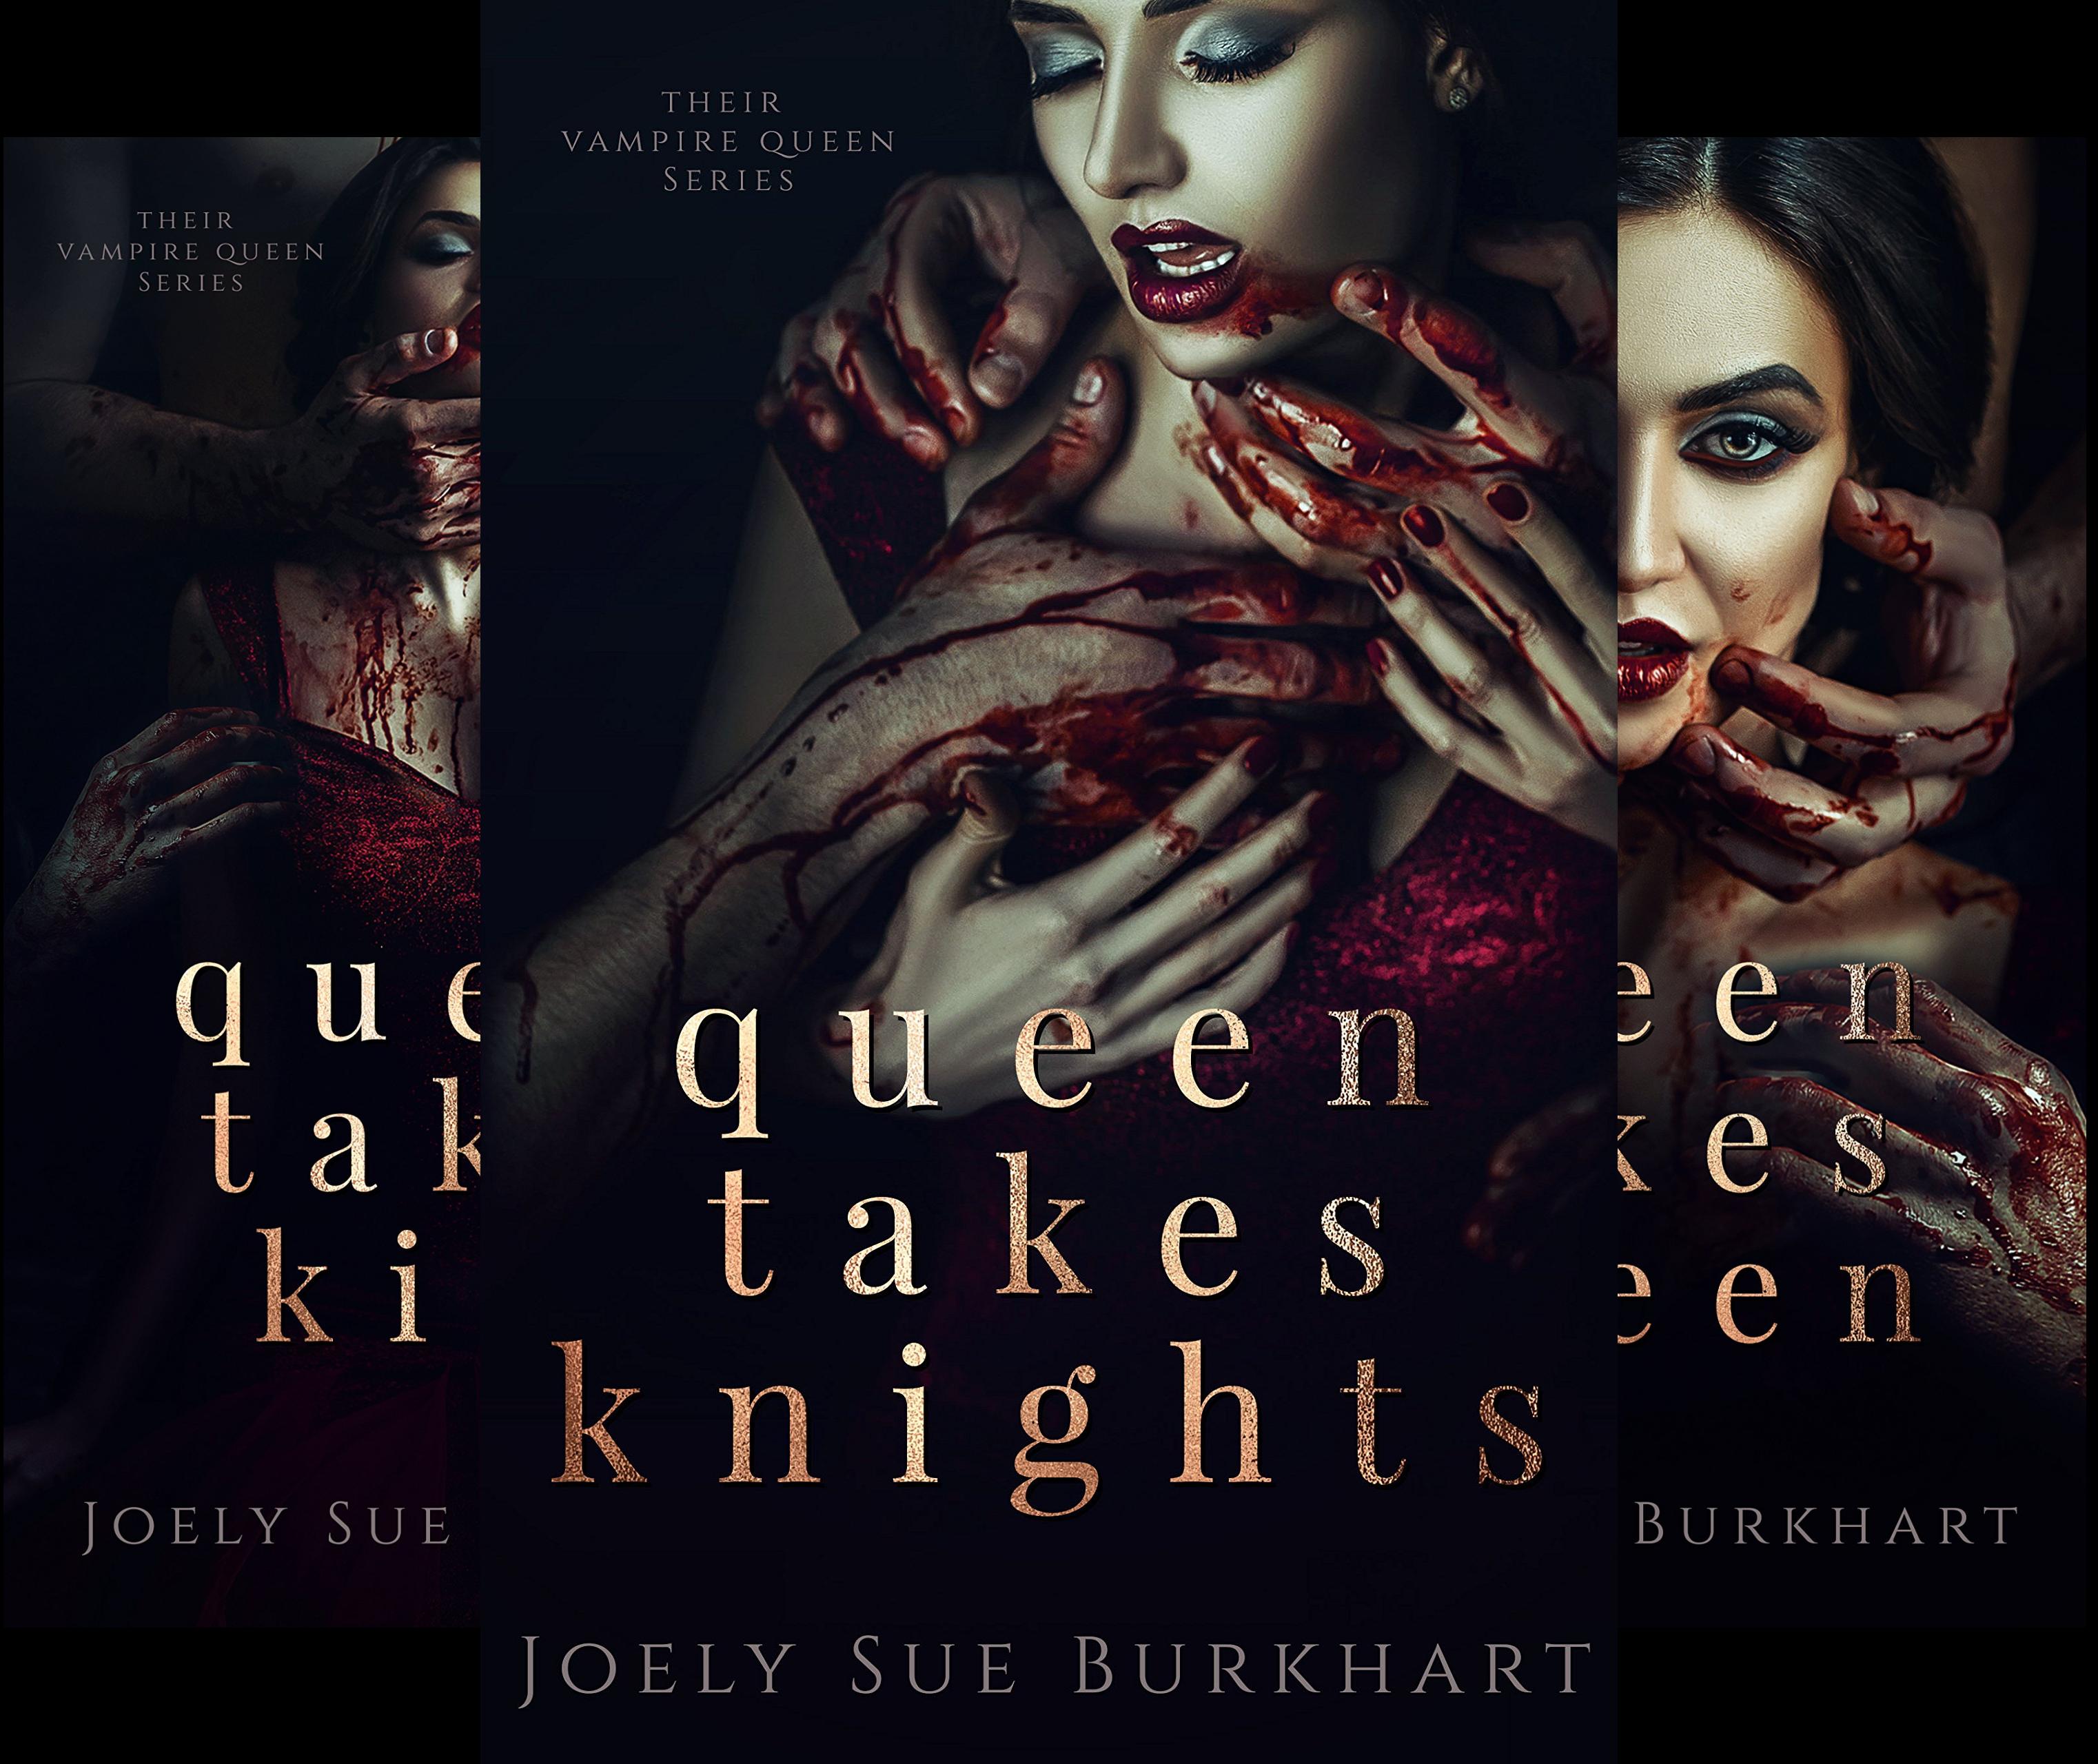 Their Vampire Queen